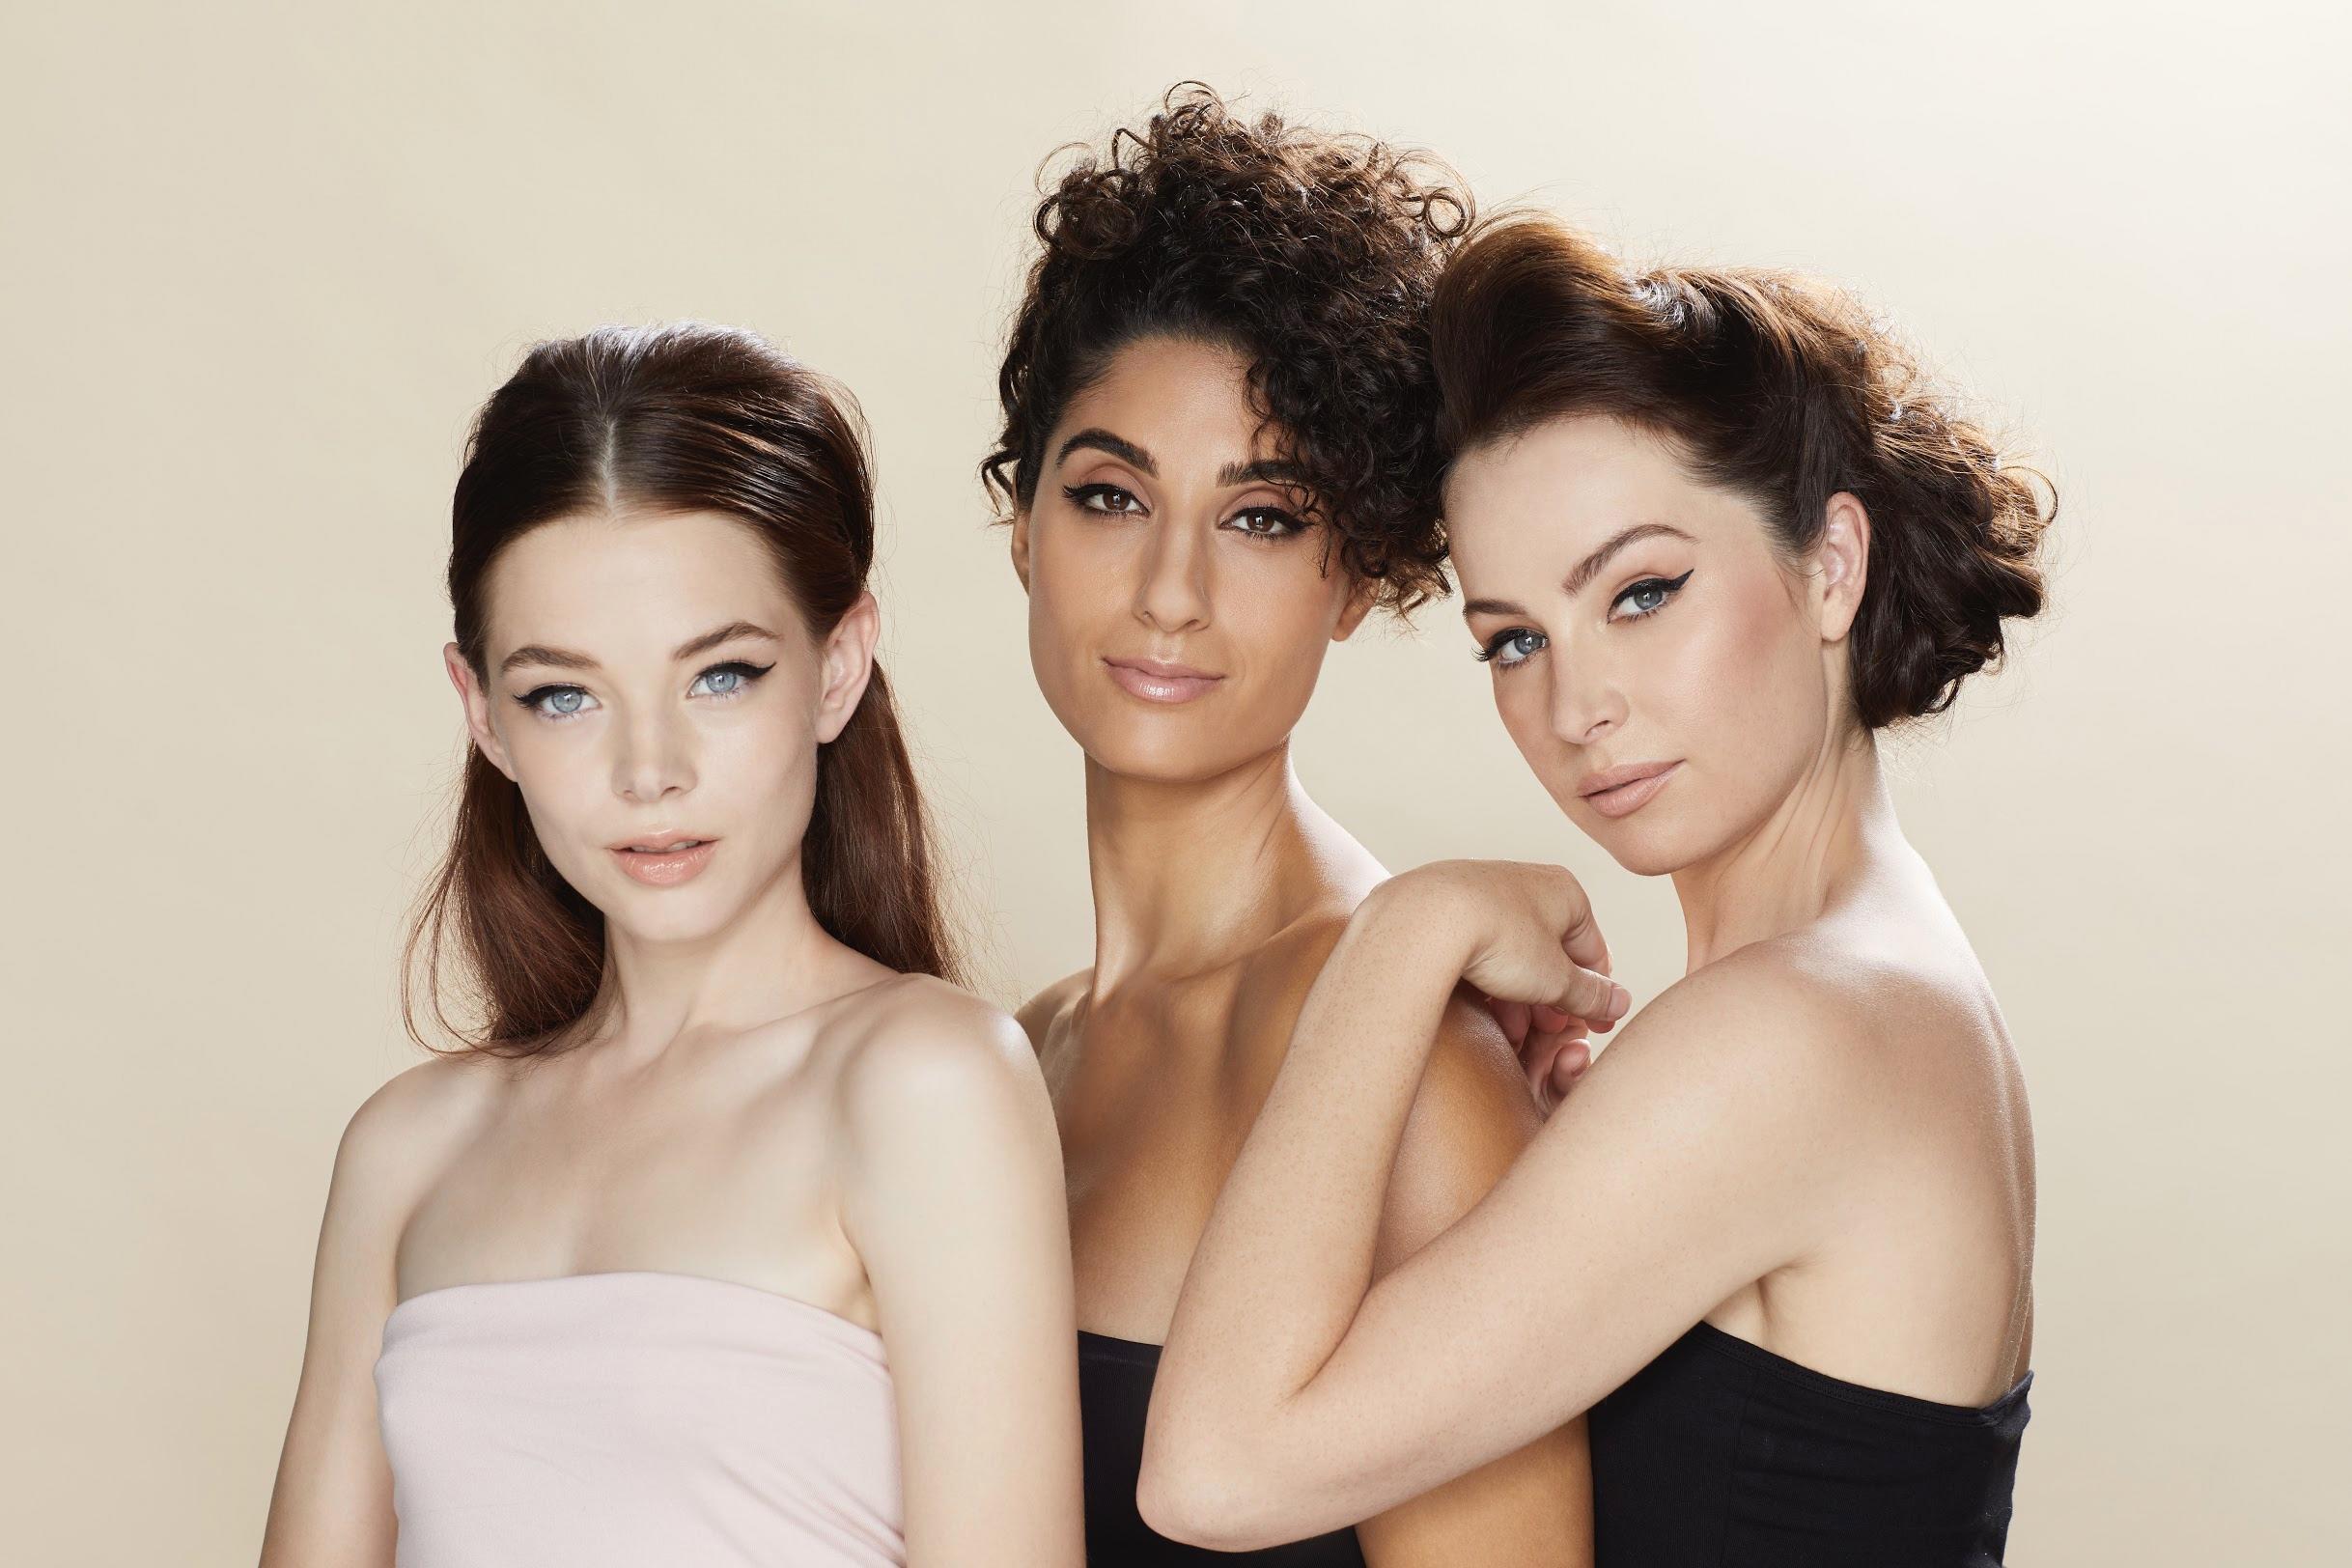 Fox Cosmetics Three Girls from space